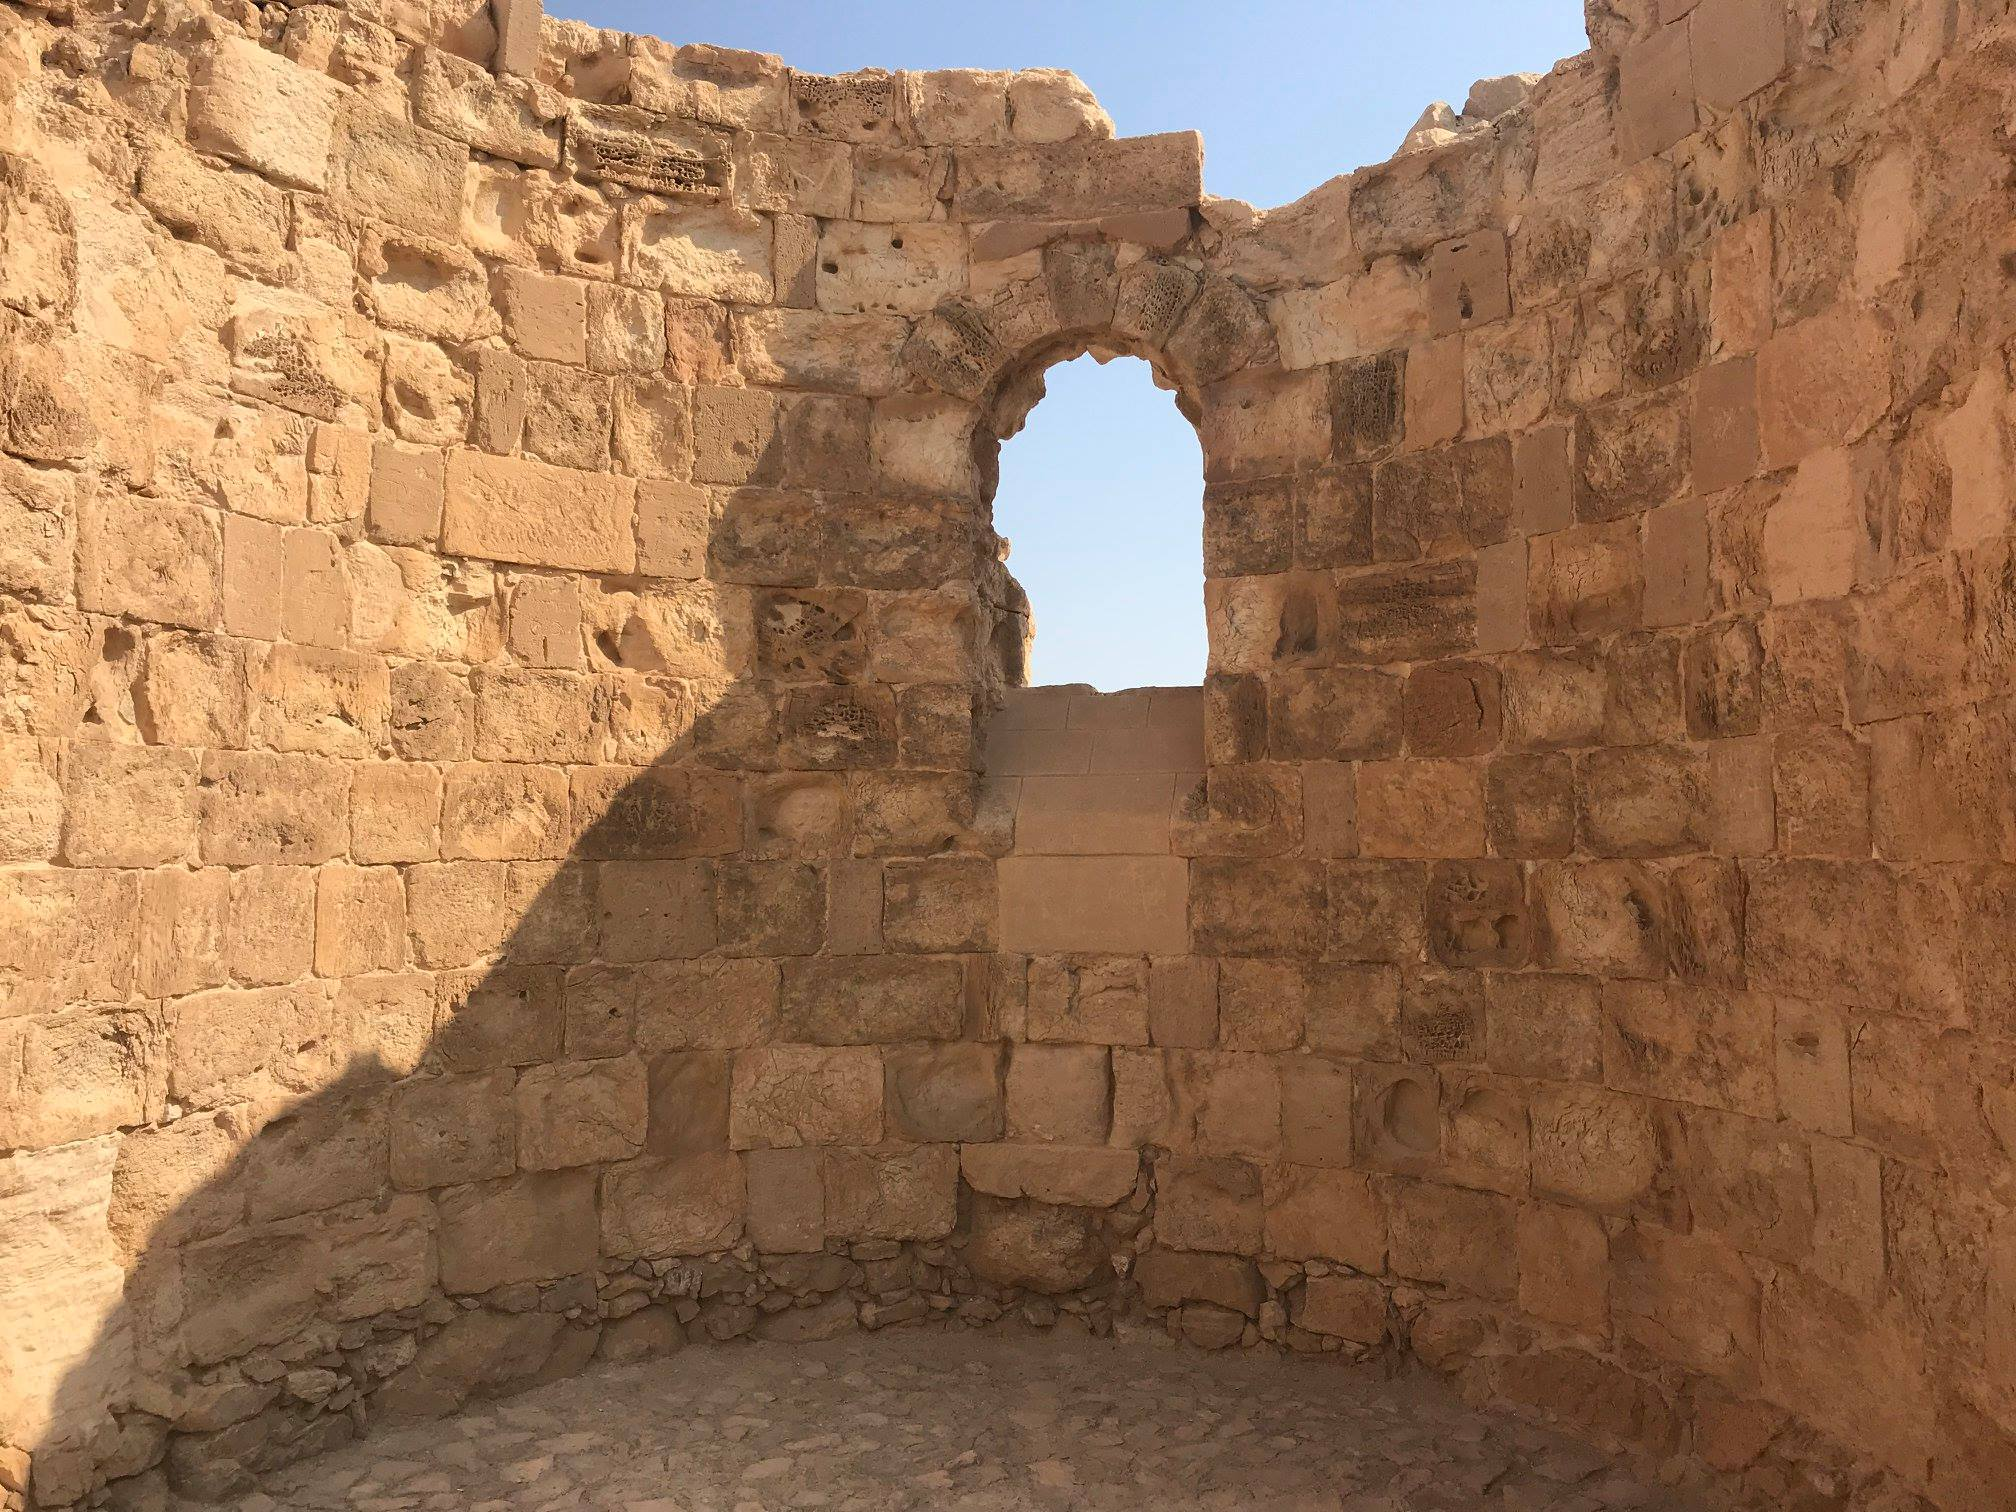 7inside Masada Tower